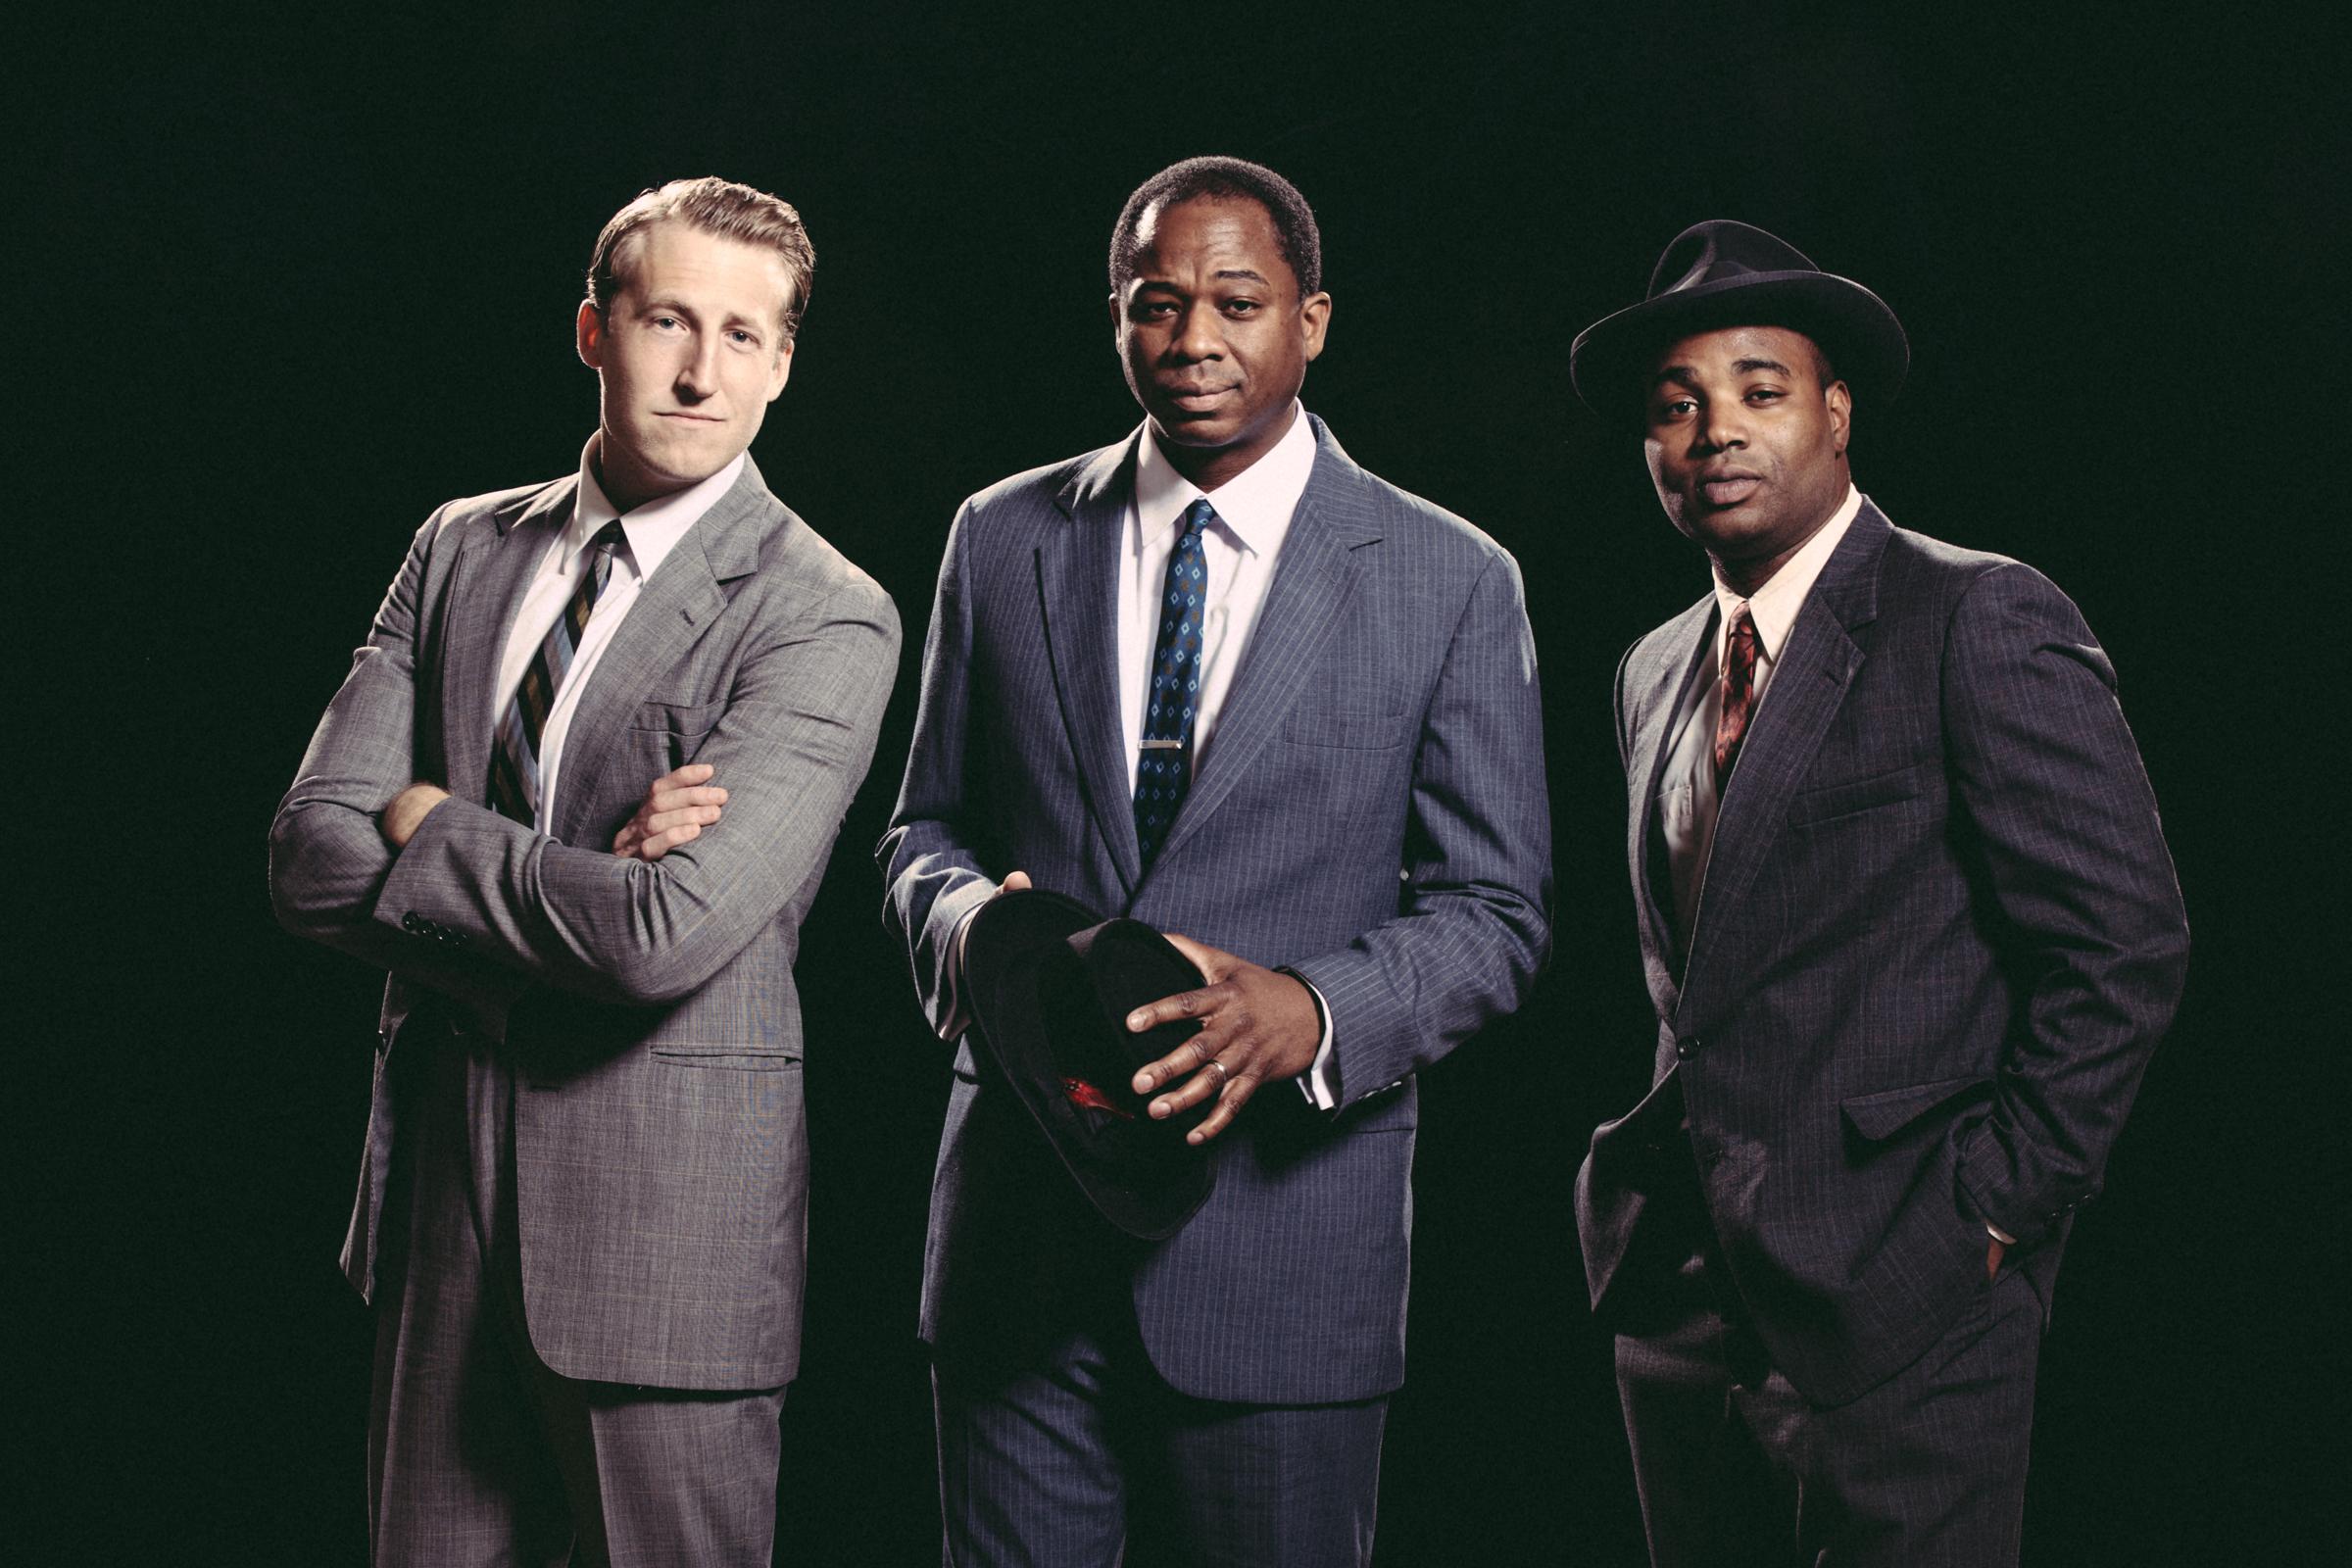 Curtis Longfellow, Cary Hite, and Austin Ashford play the 1962 members of Nina Simone's band.